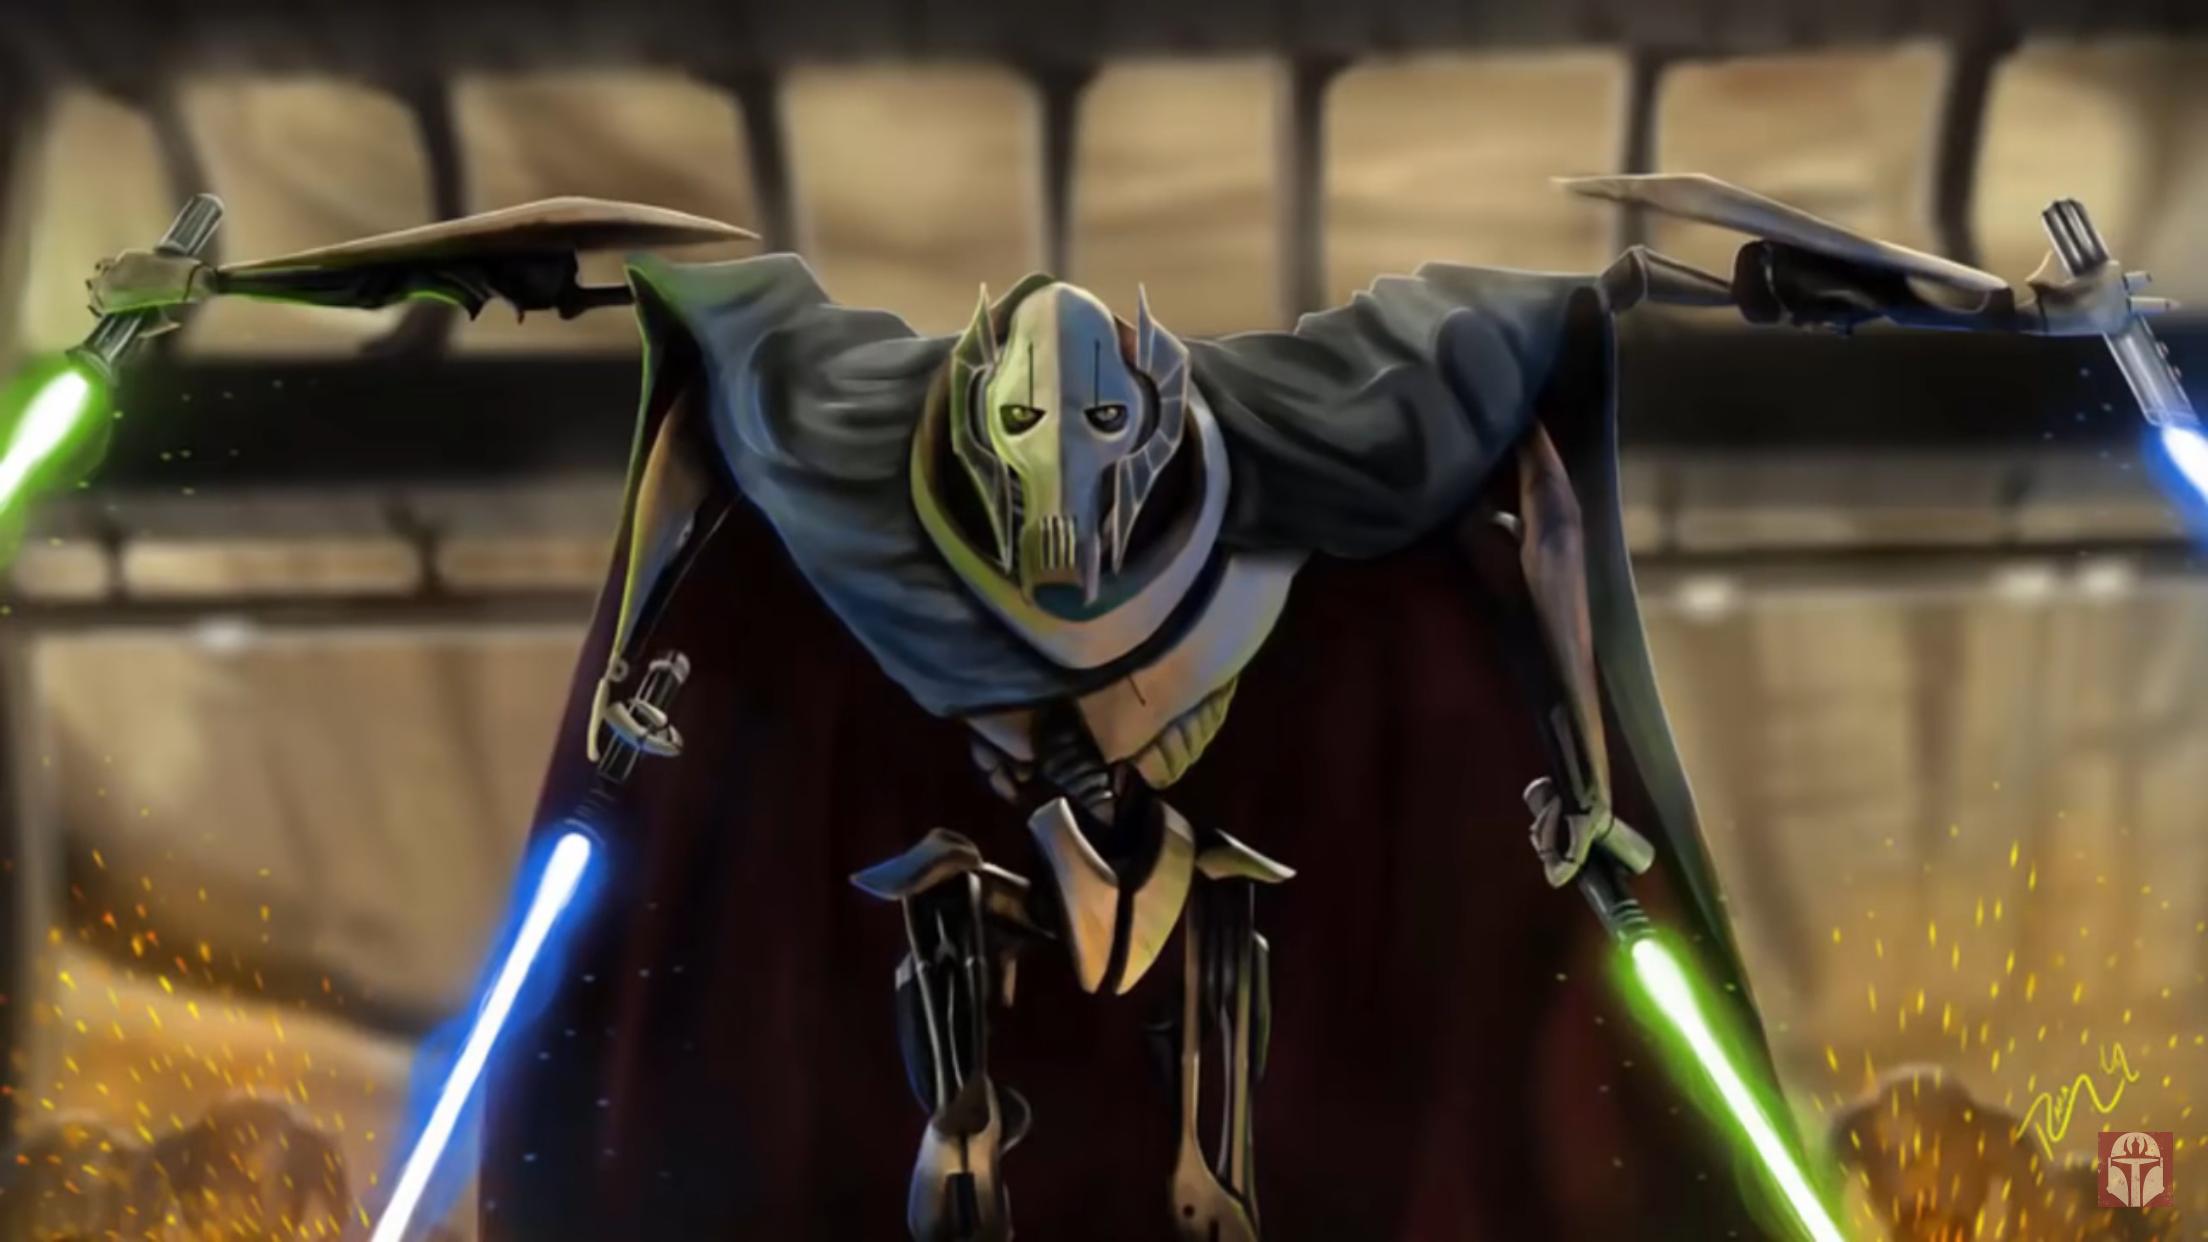 General Grievous Star Wars Geek Star Wars Poster Star Wars Characters